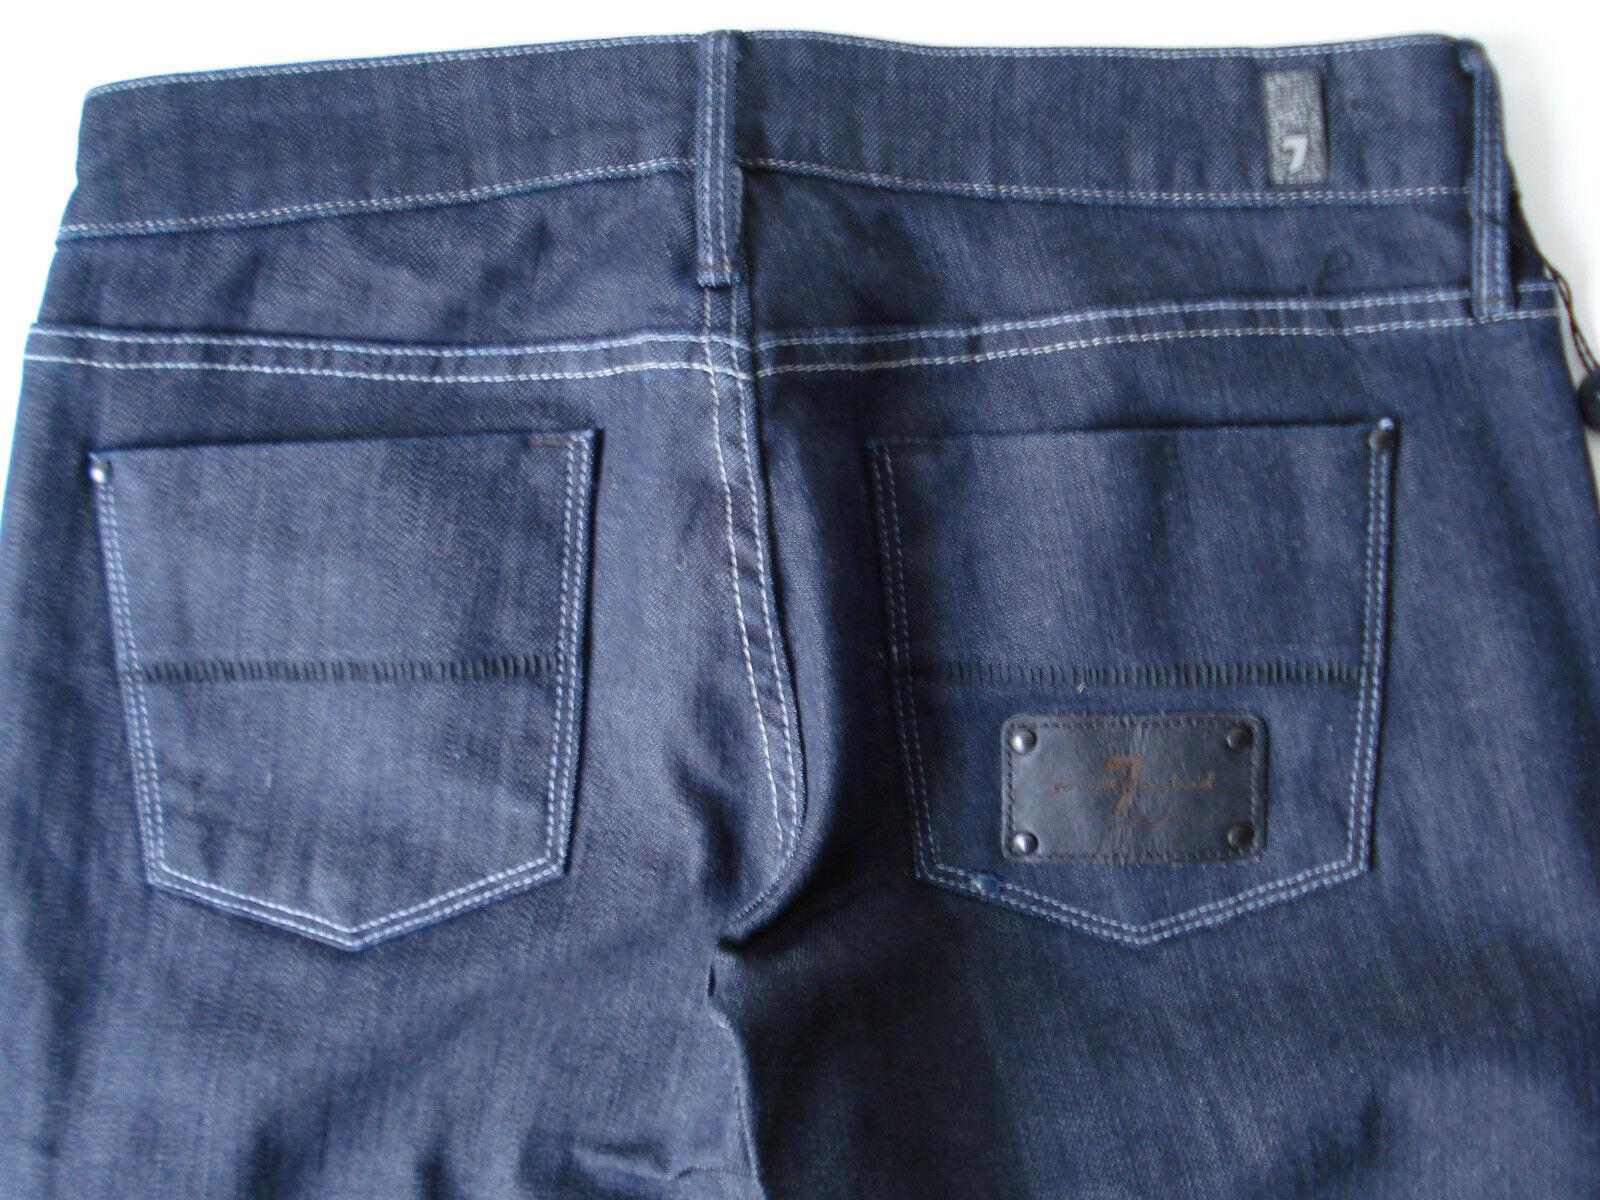 Seven for all Mankind SFAM Ava Jeans Denim Hose blue Gr 26 28